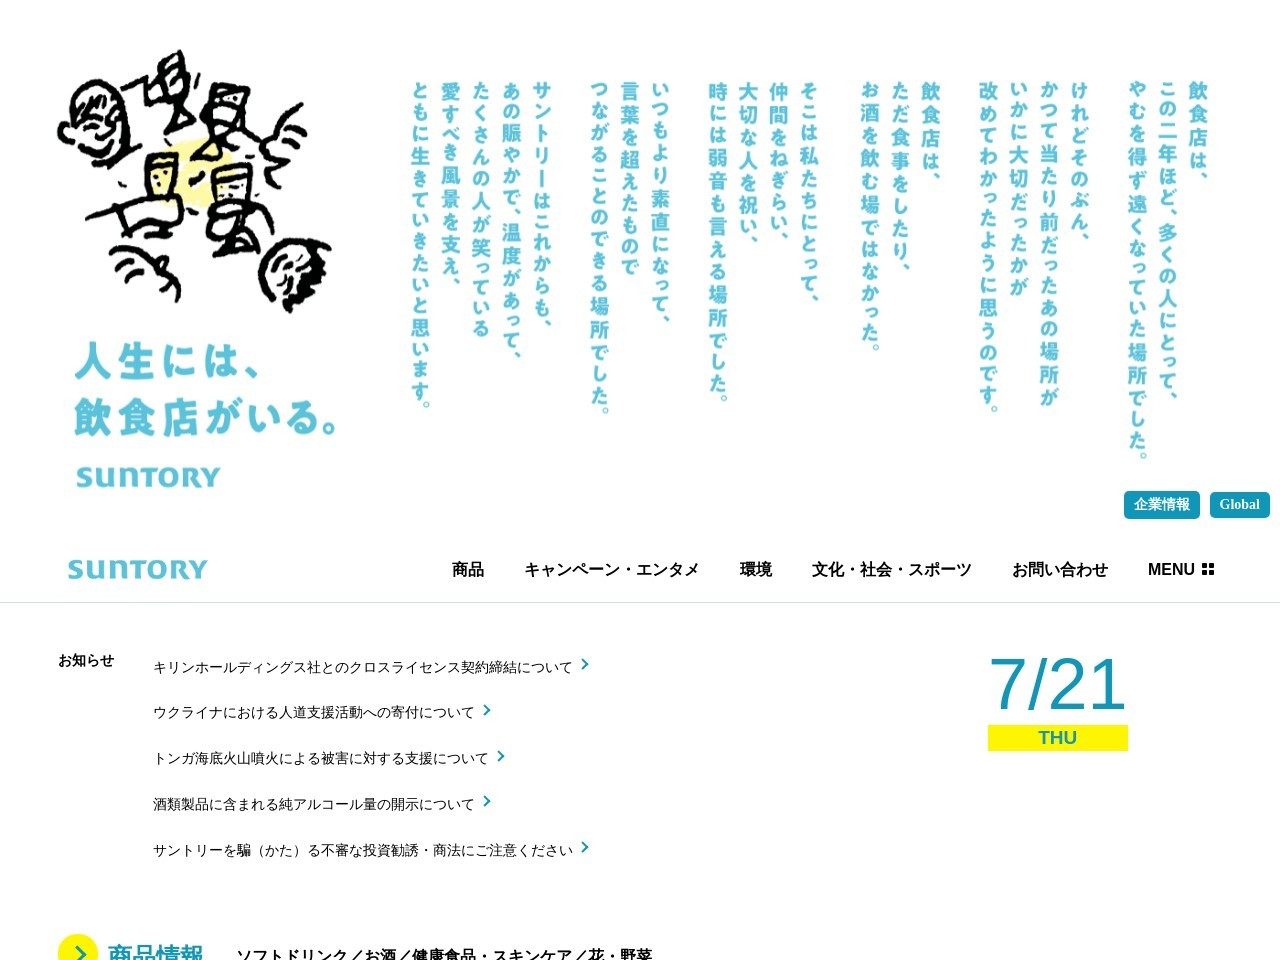 http://www.suntory.co.jp/company/mizu/jiten/life/li_10_01.html